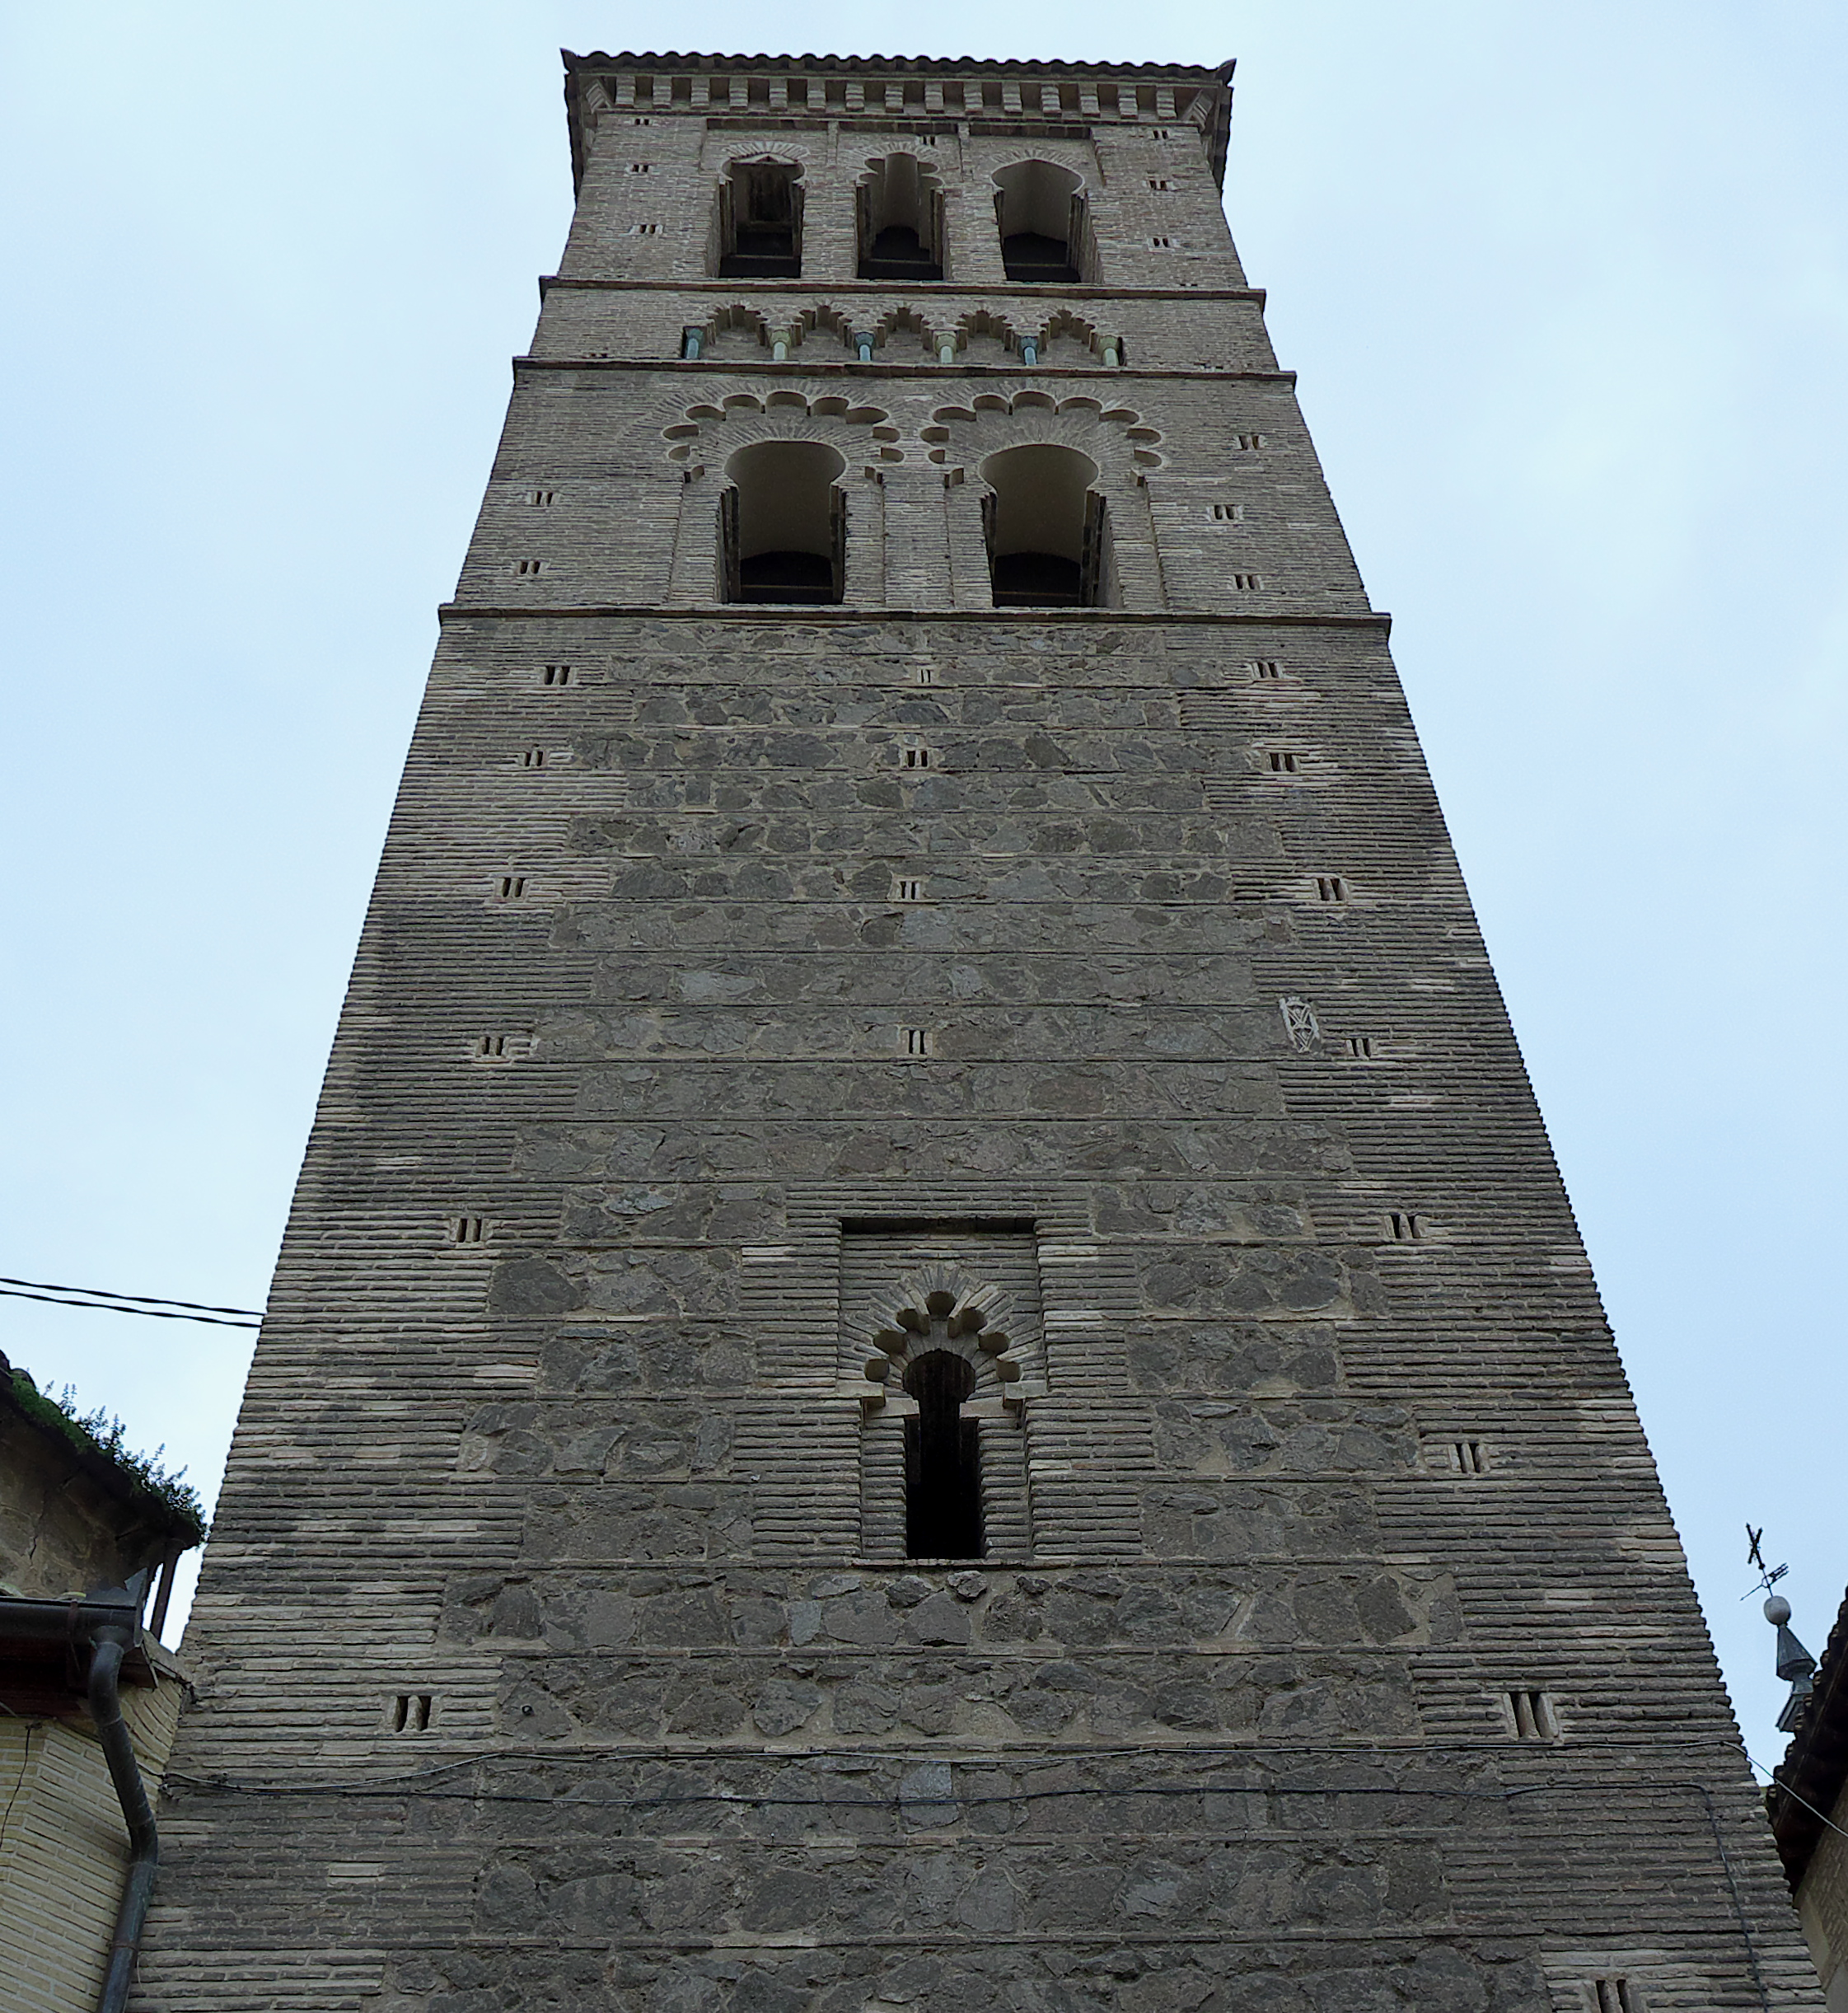 File:Iglesia de Santo Tomé (Toledo). Torre.jpg - Wikimedia ...